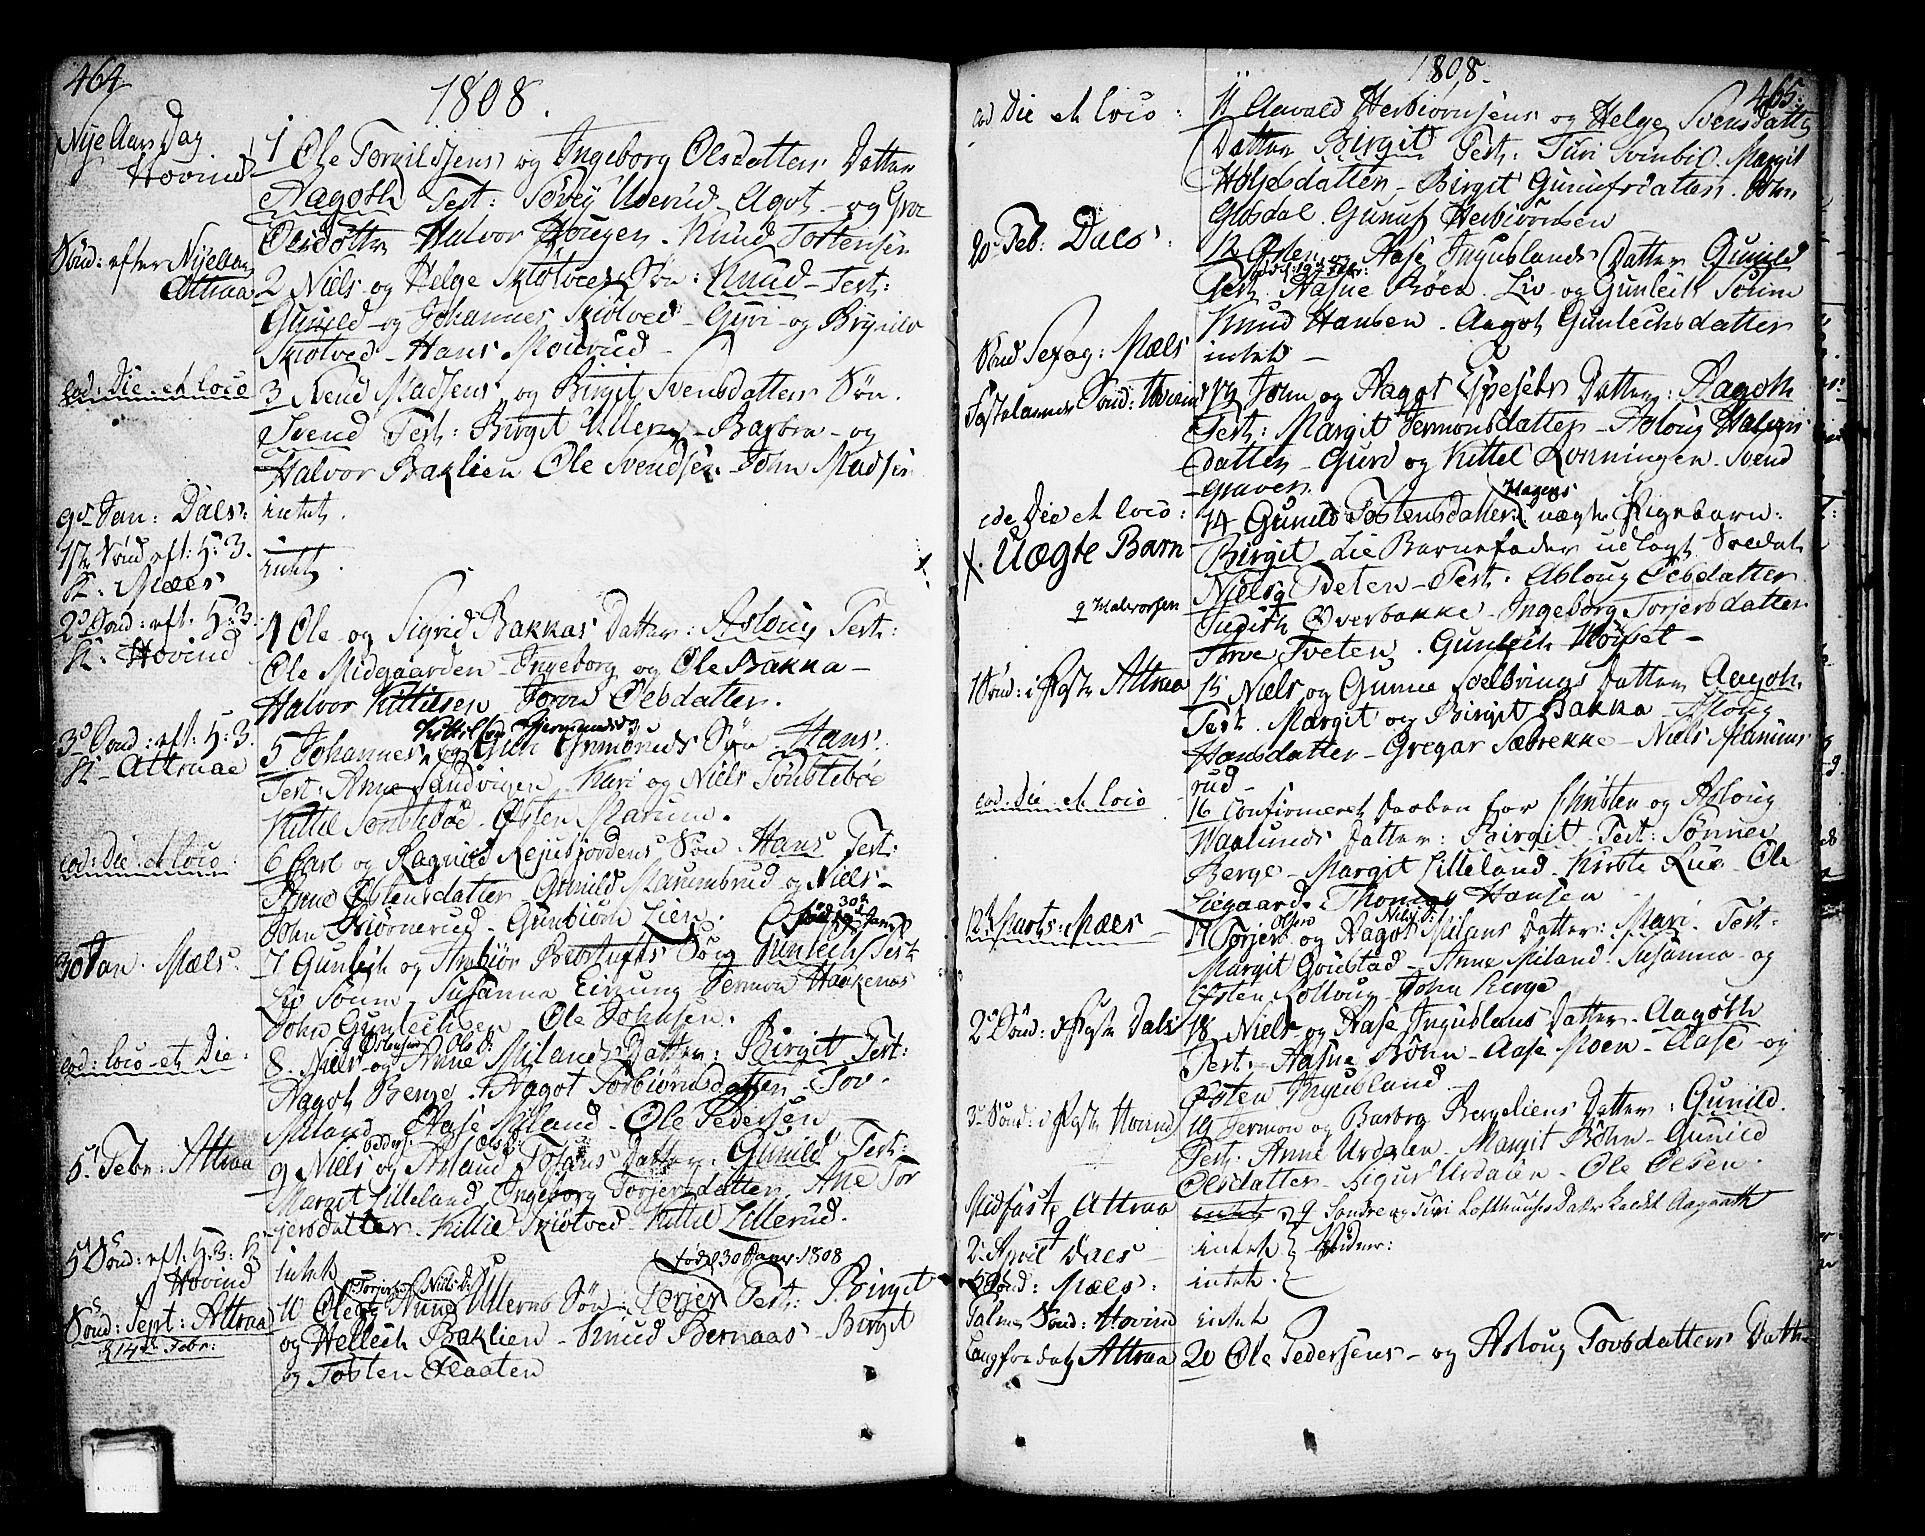 SAKO, Tinn kirkebøker, F/Fa/L0002: Ministerialbok nr. I 2, 1757-1810, s. 464-465